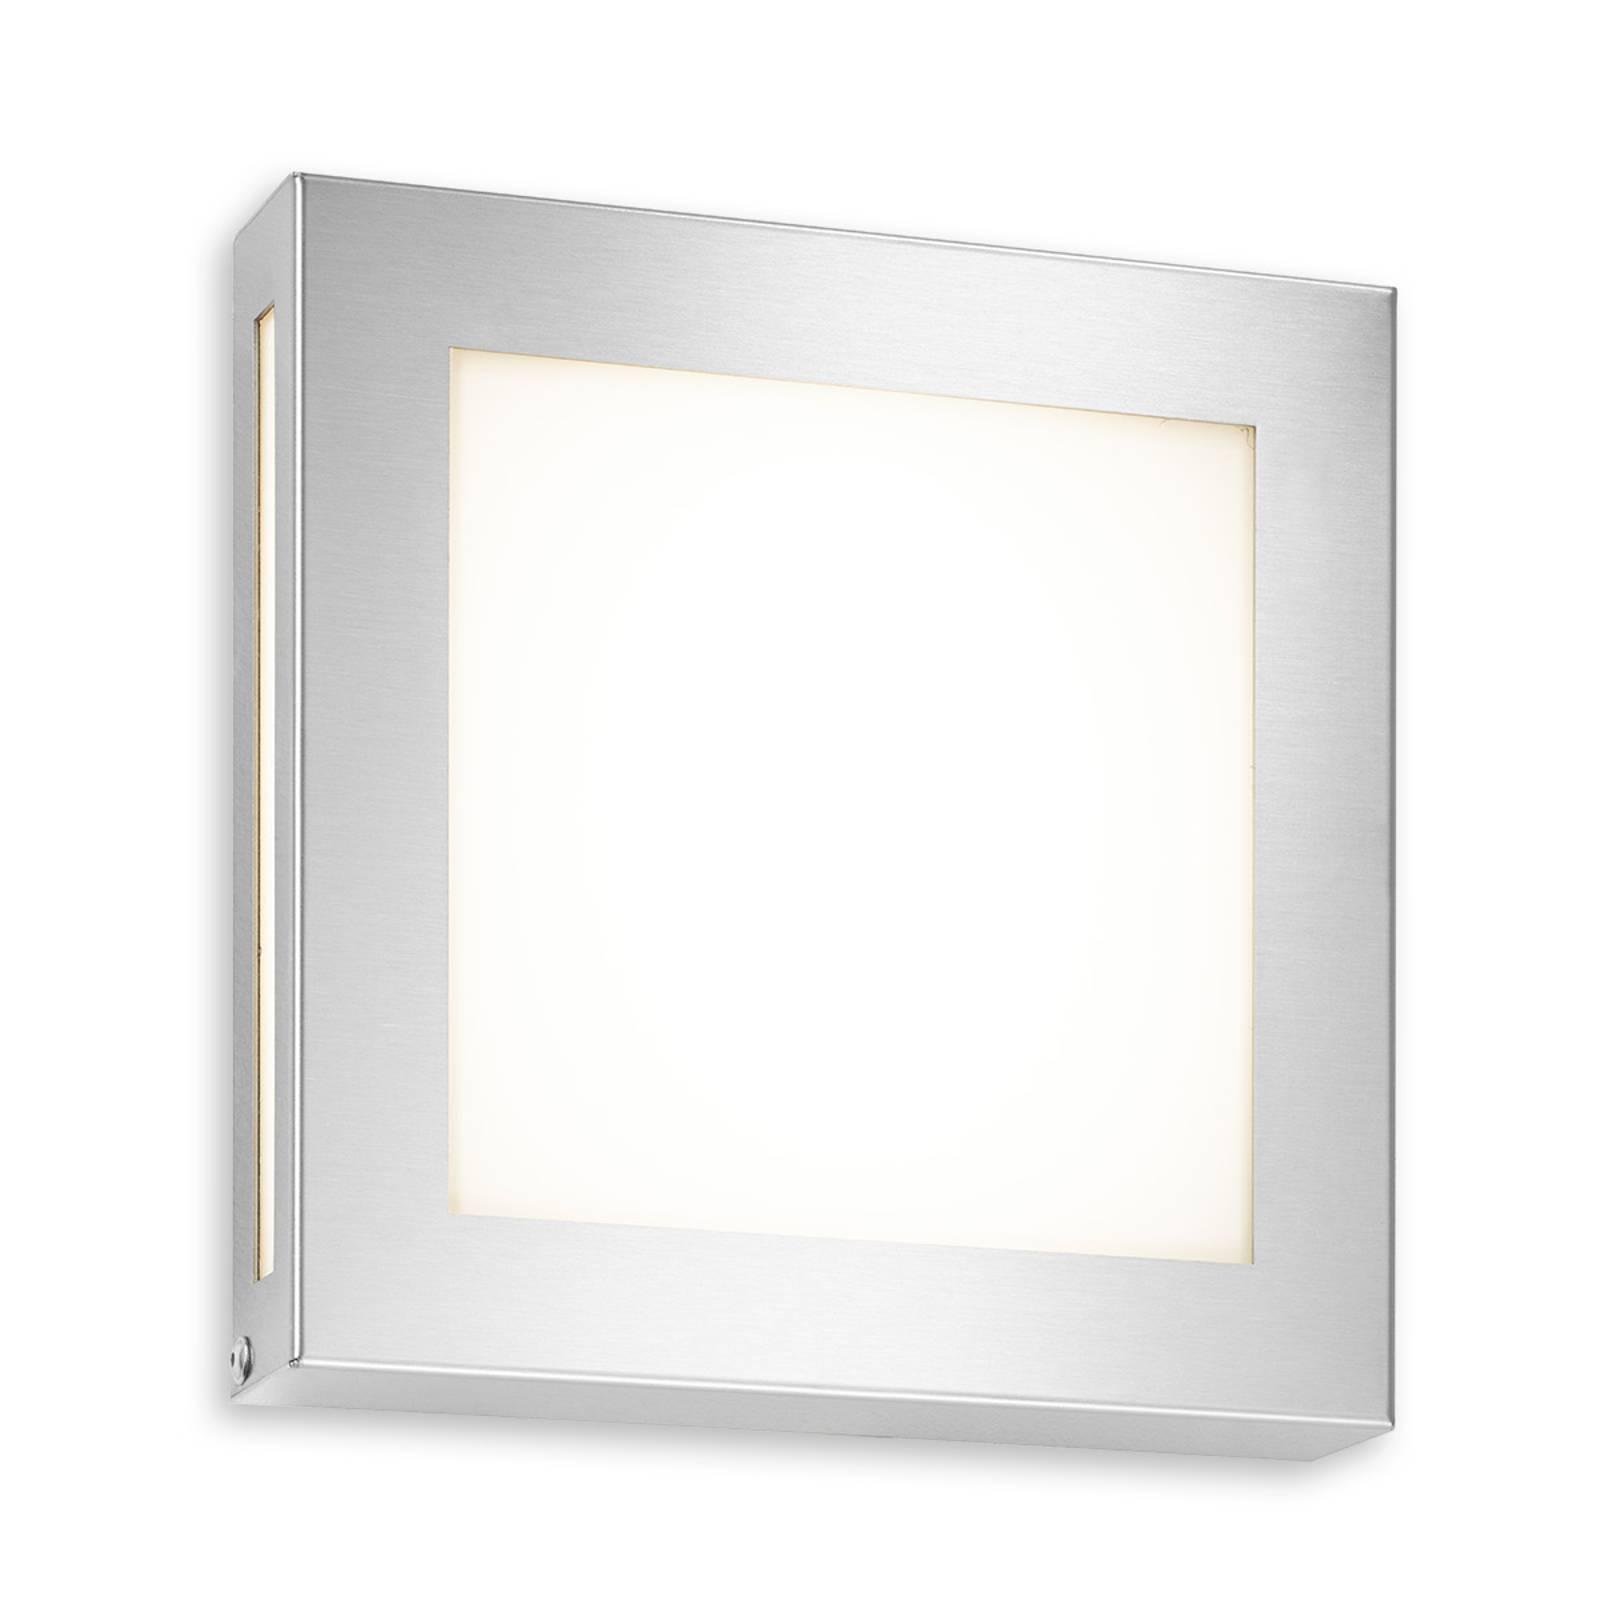 Roestvrijstalen buitenwandlamp Legendo Mini m. LED